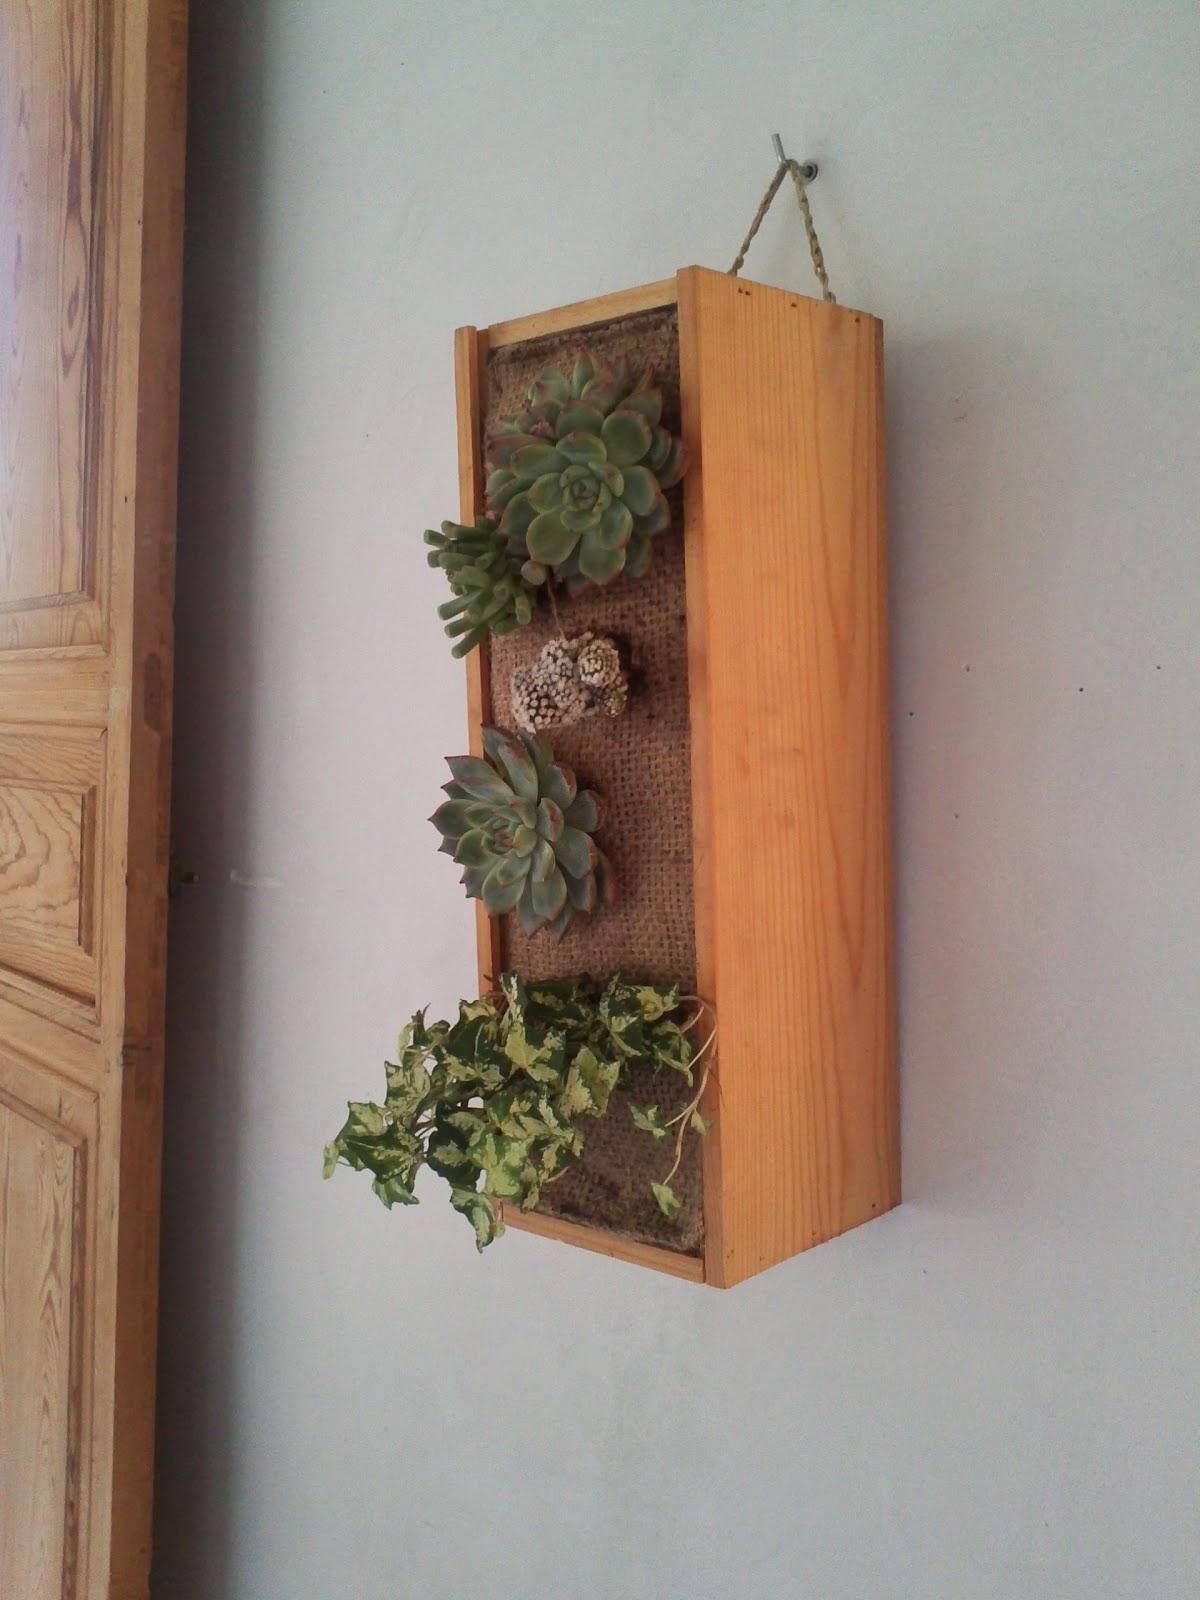 painting cat jardin vertical vertical garden. Black Bedroom Furniture Sets. Home Design Ideas